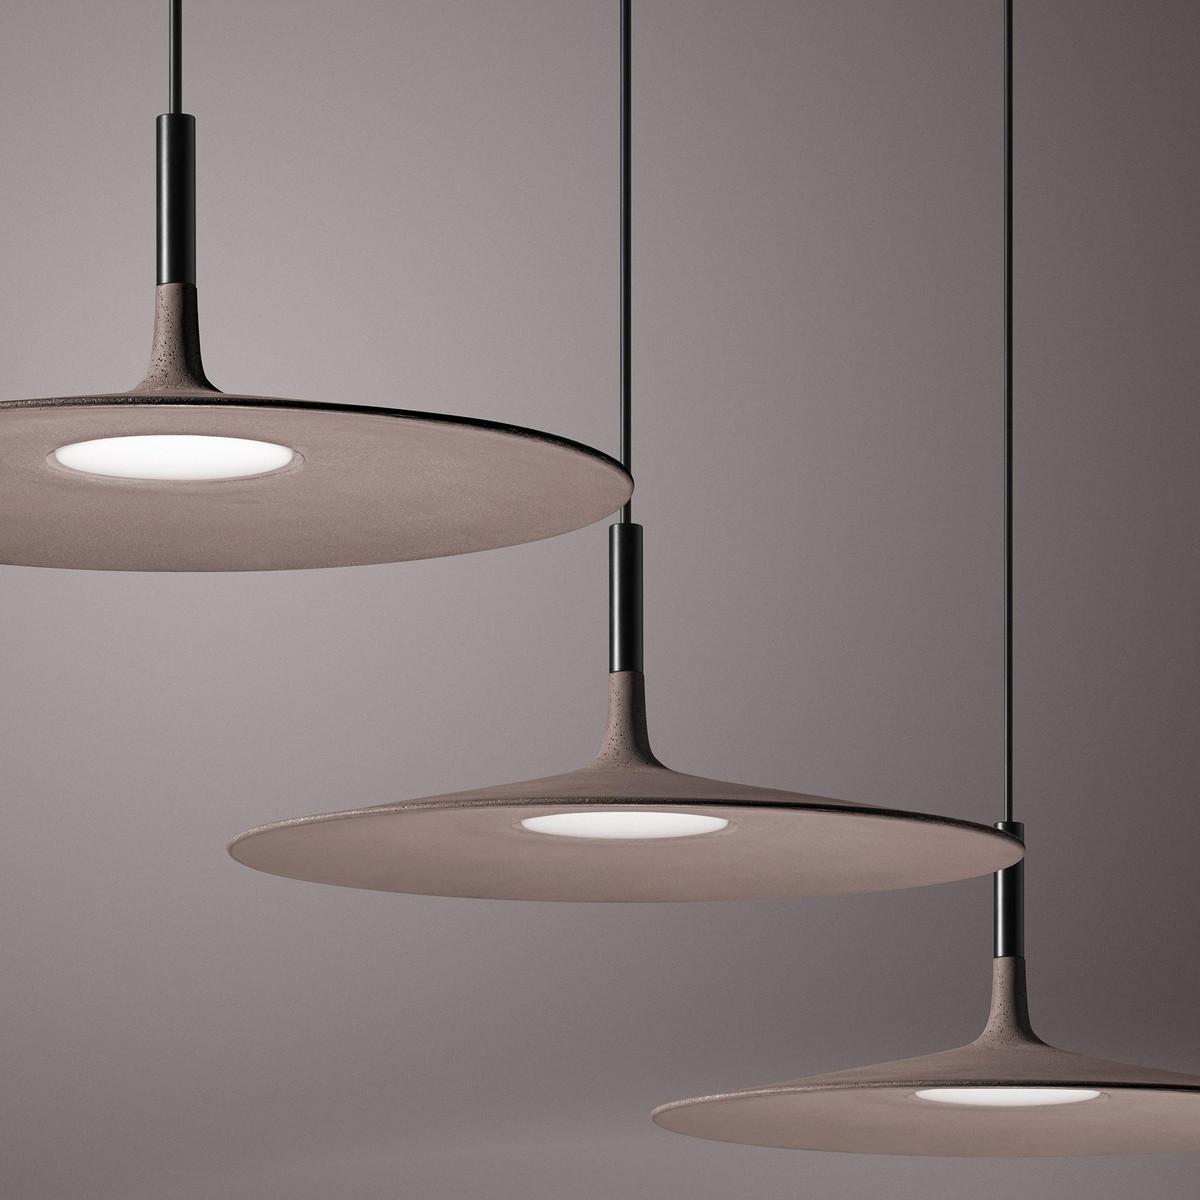 aplomb large led pendelleuchte foscarini. Black Bedroom Furniture Sets. Home Design Ideas